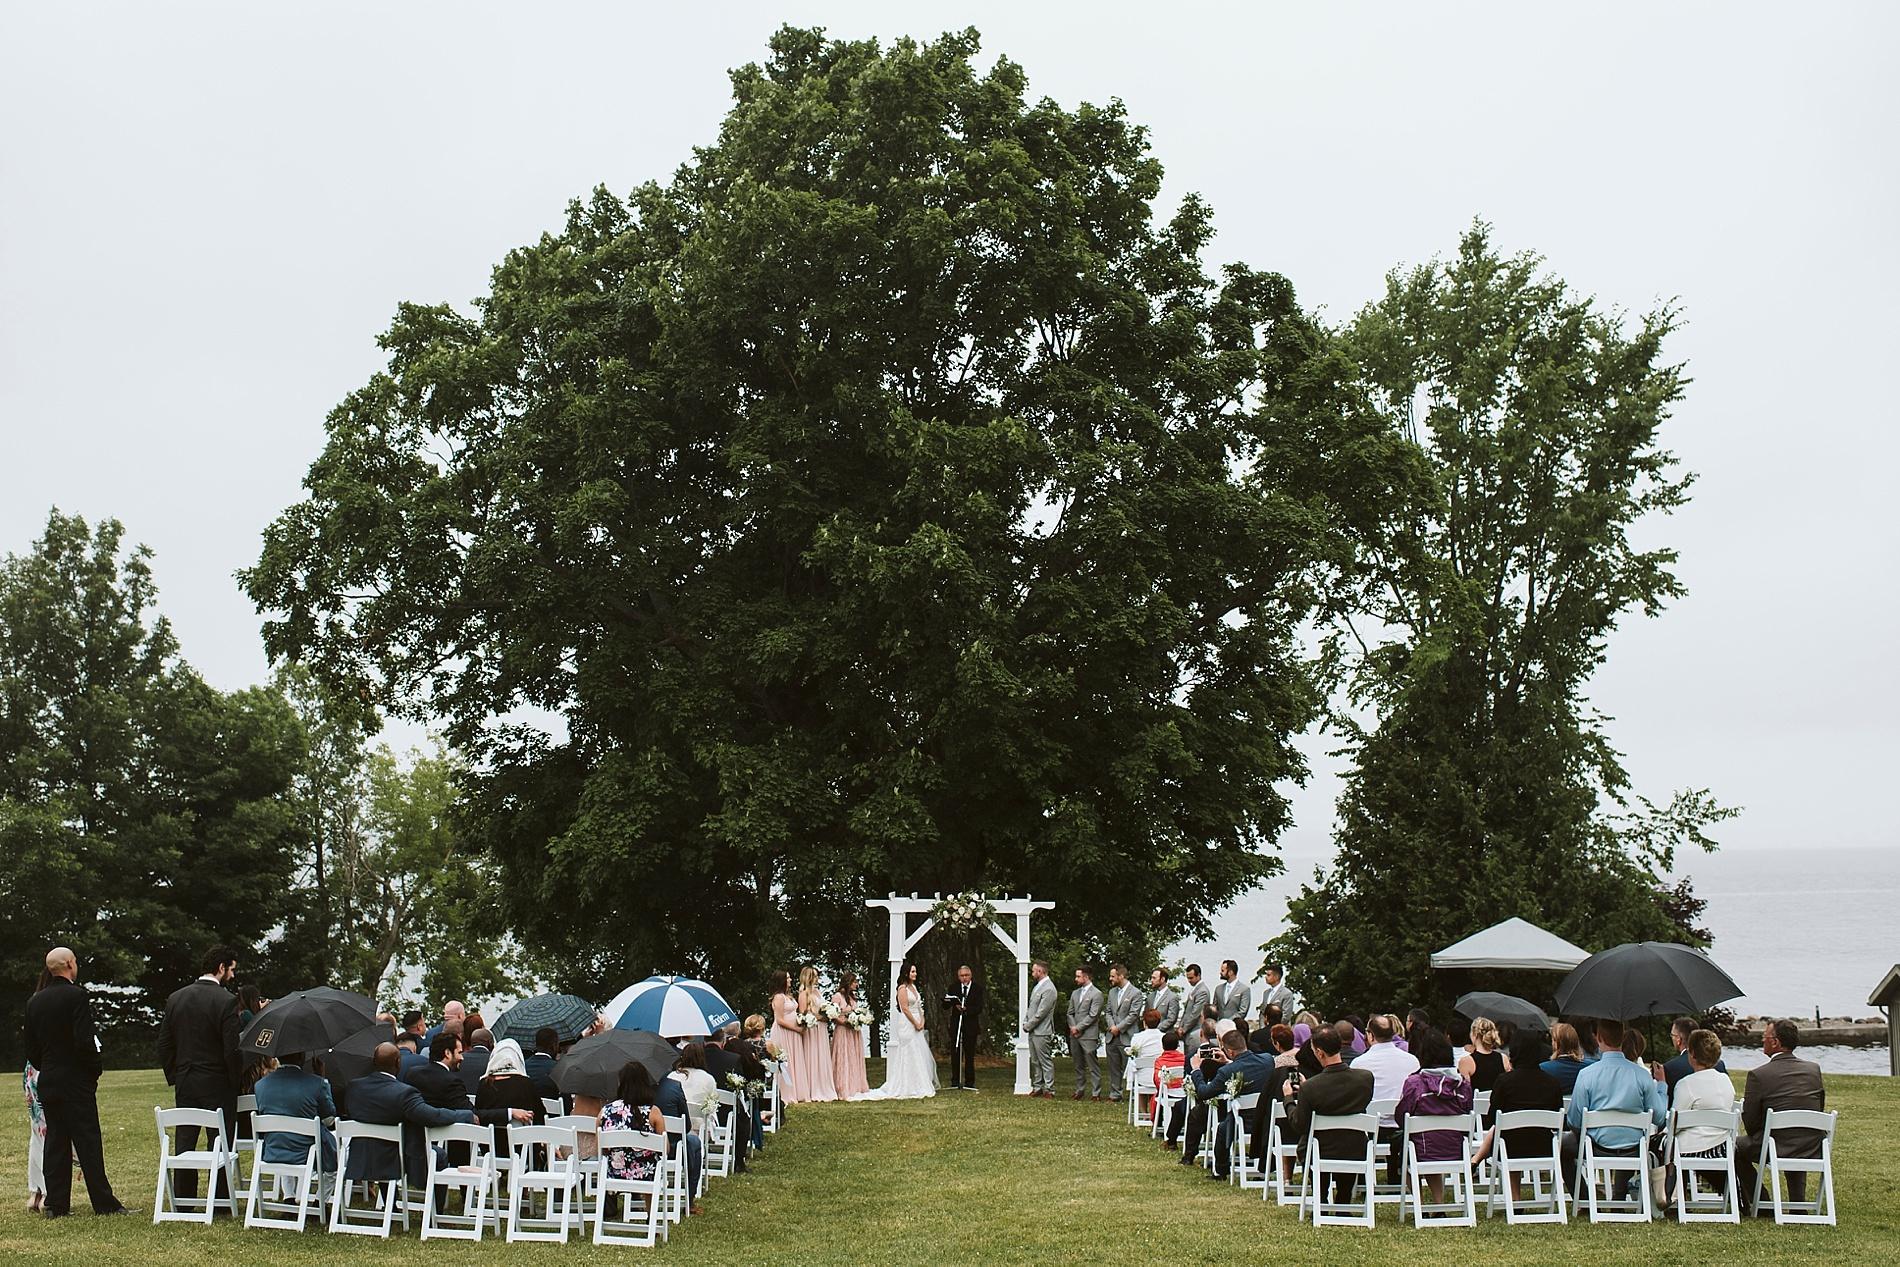 Kawartha_Lakes_Wedding_Bobcageon_Eganridge_Resort_Toronto_Photographer_0034.jpg